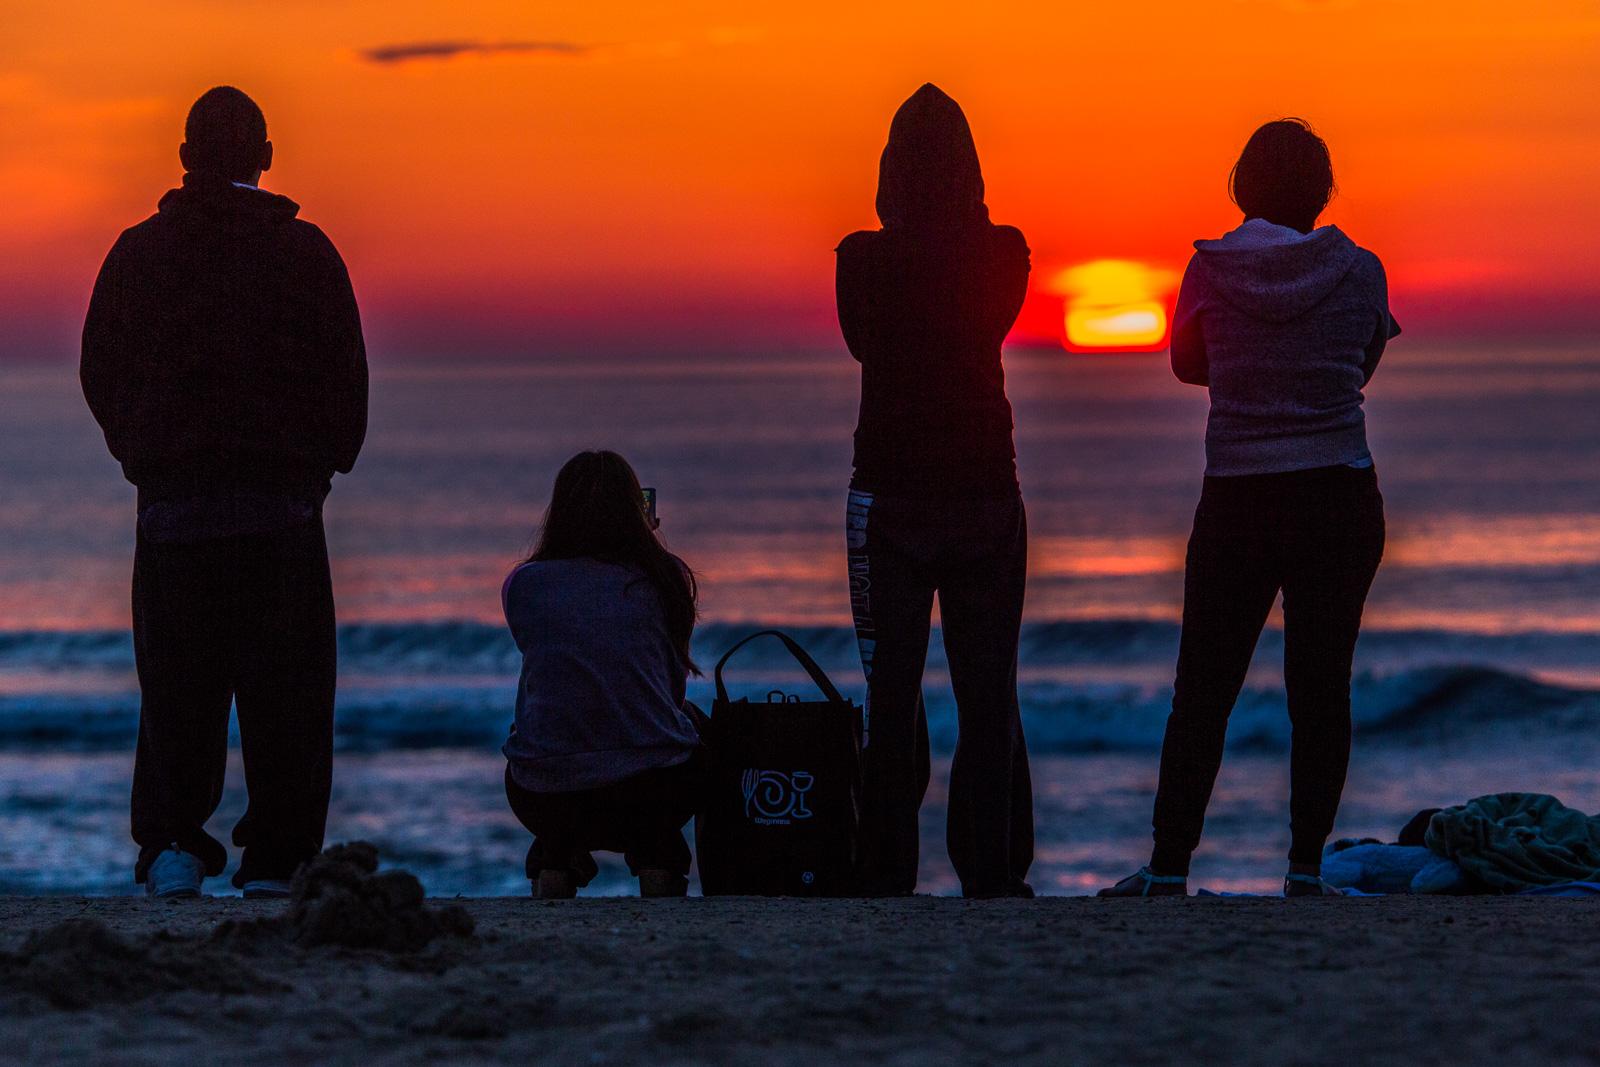 _C8A1301 - Richard Mallory Allnutt photo - On the Beach - Virginia Beach, VA - May 18, 2014.jpg